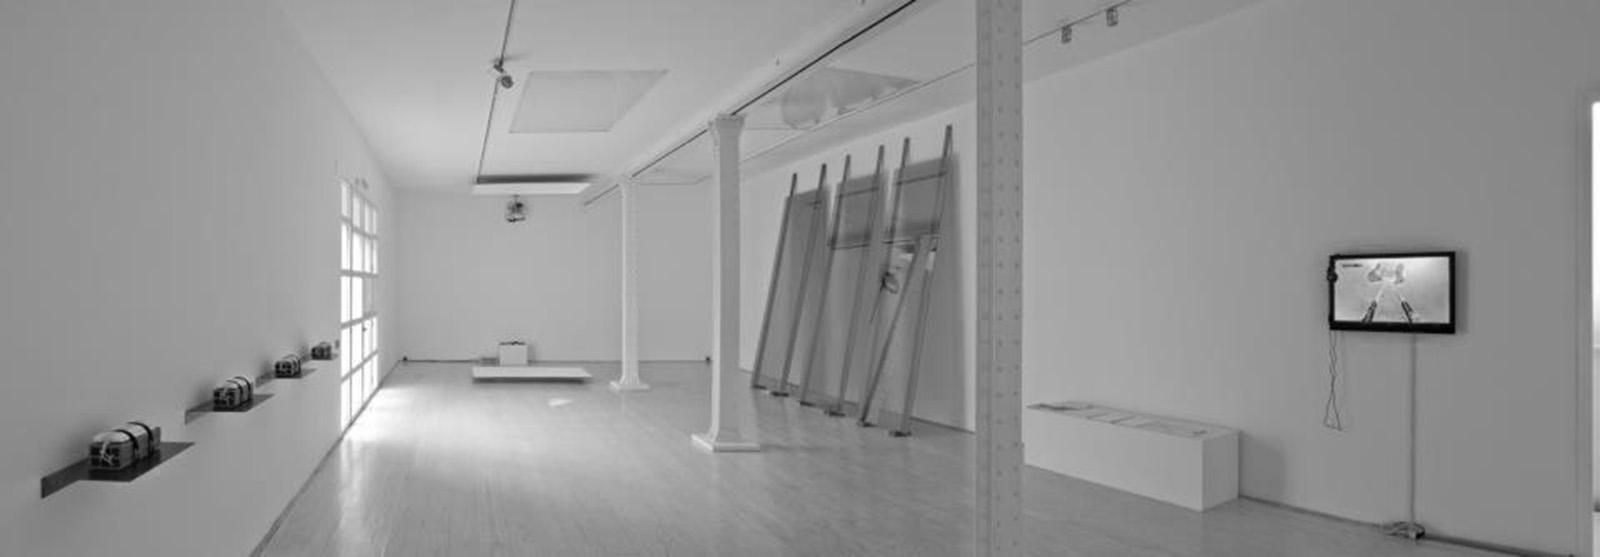 proyector-plataforma-de-videoarte2012-sede-galeriaevaruiz